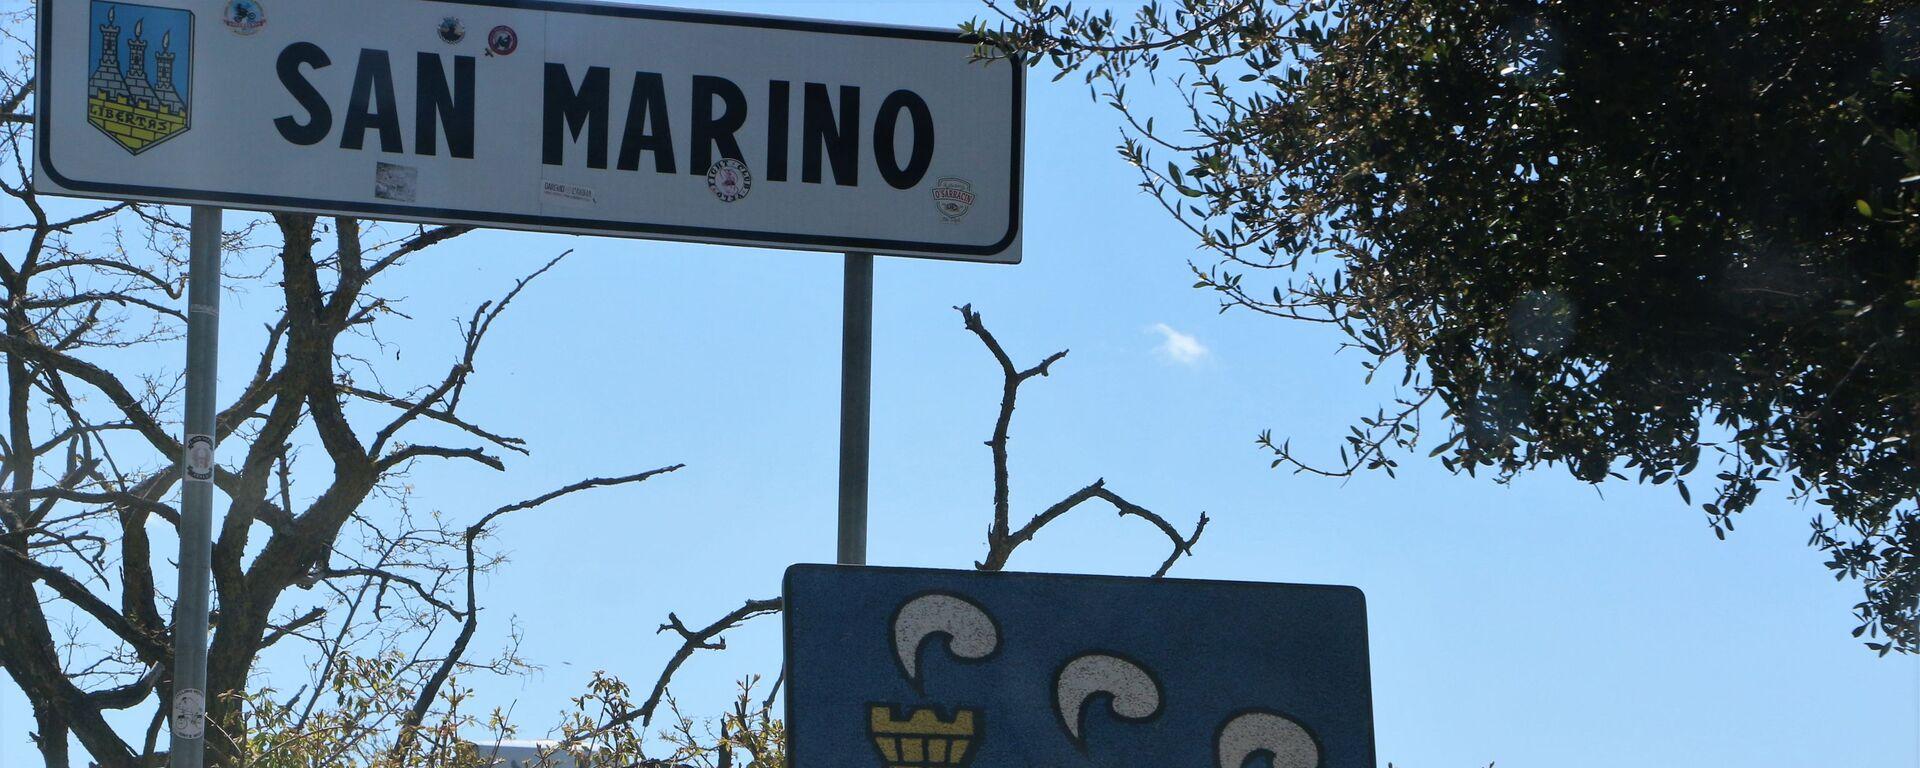 Vista di San Marino - Sputnik Italia, 1920, 29.07.2021